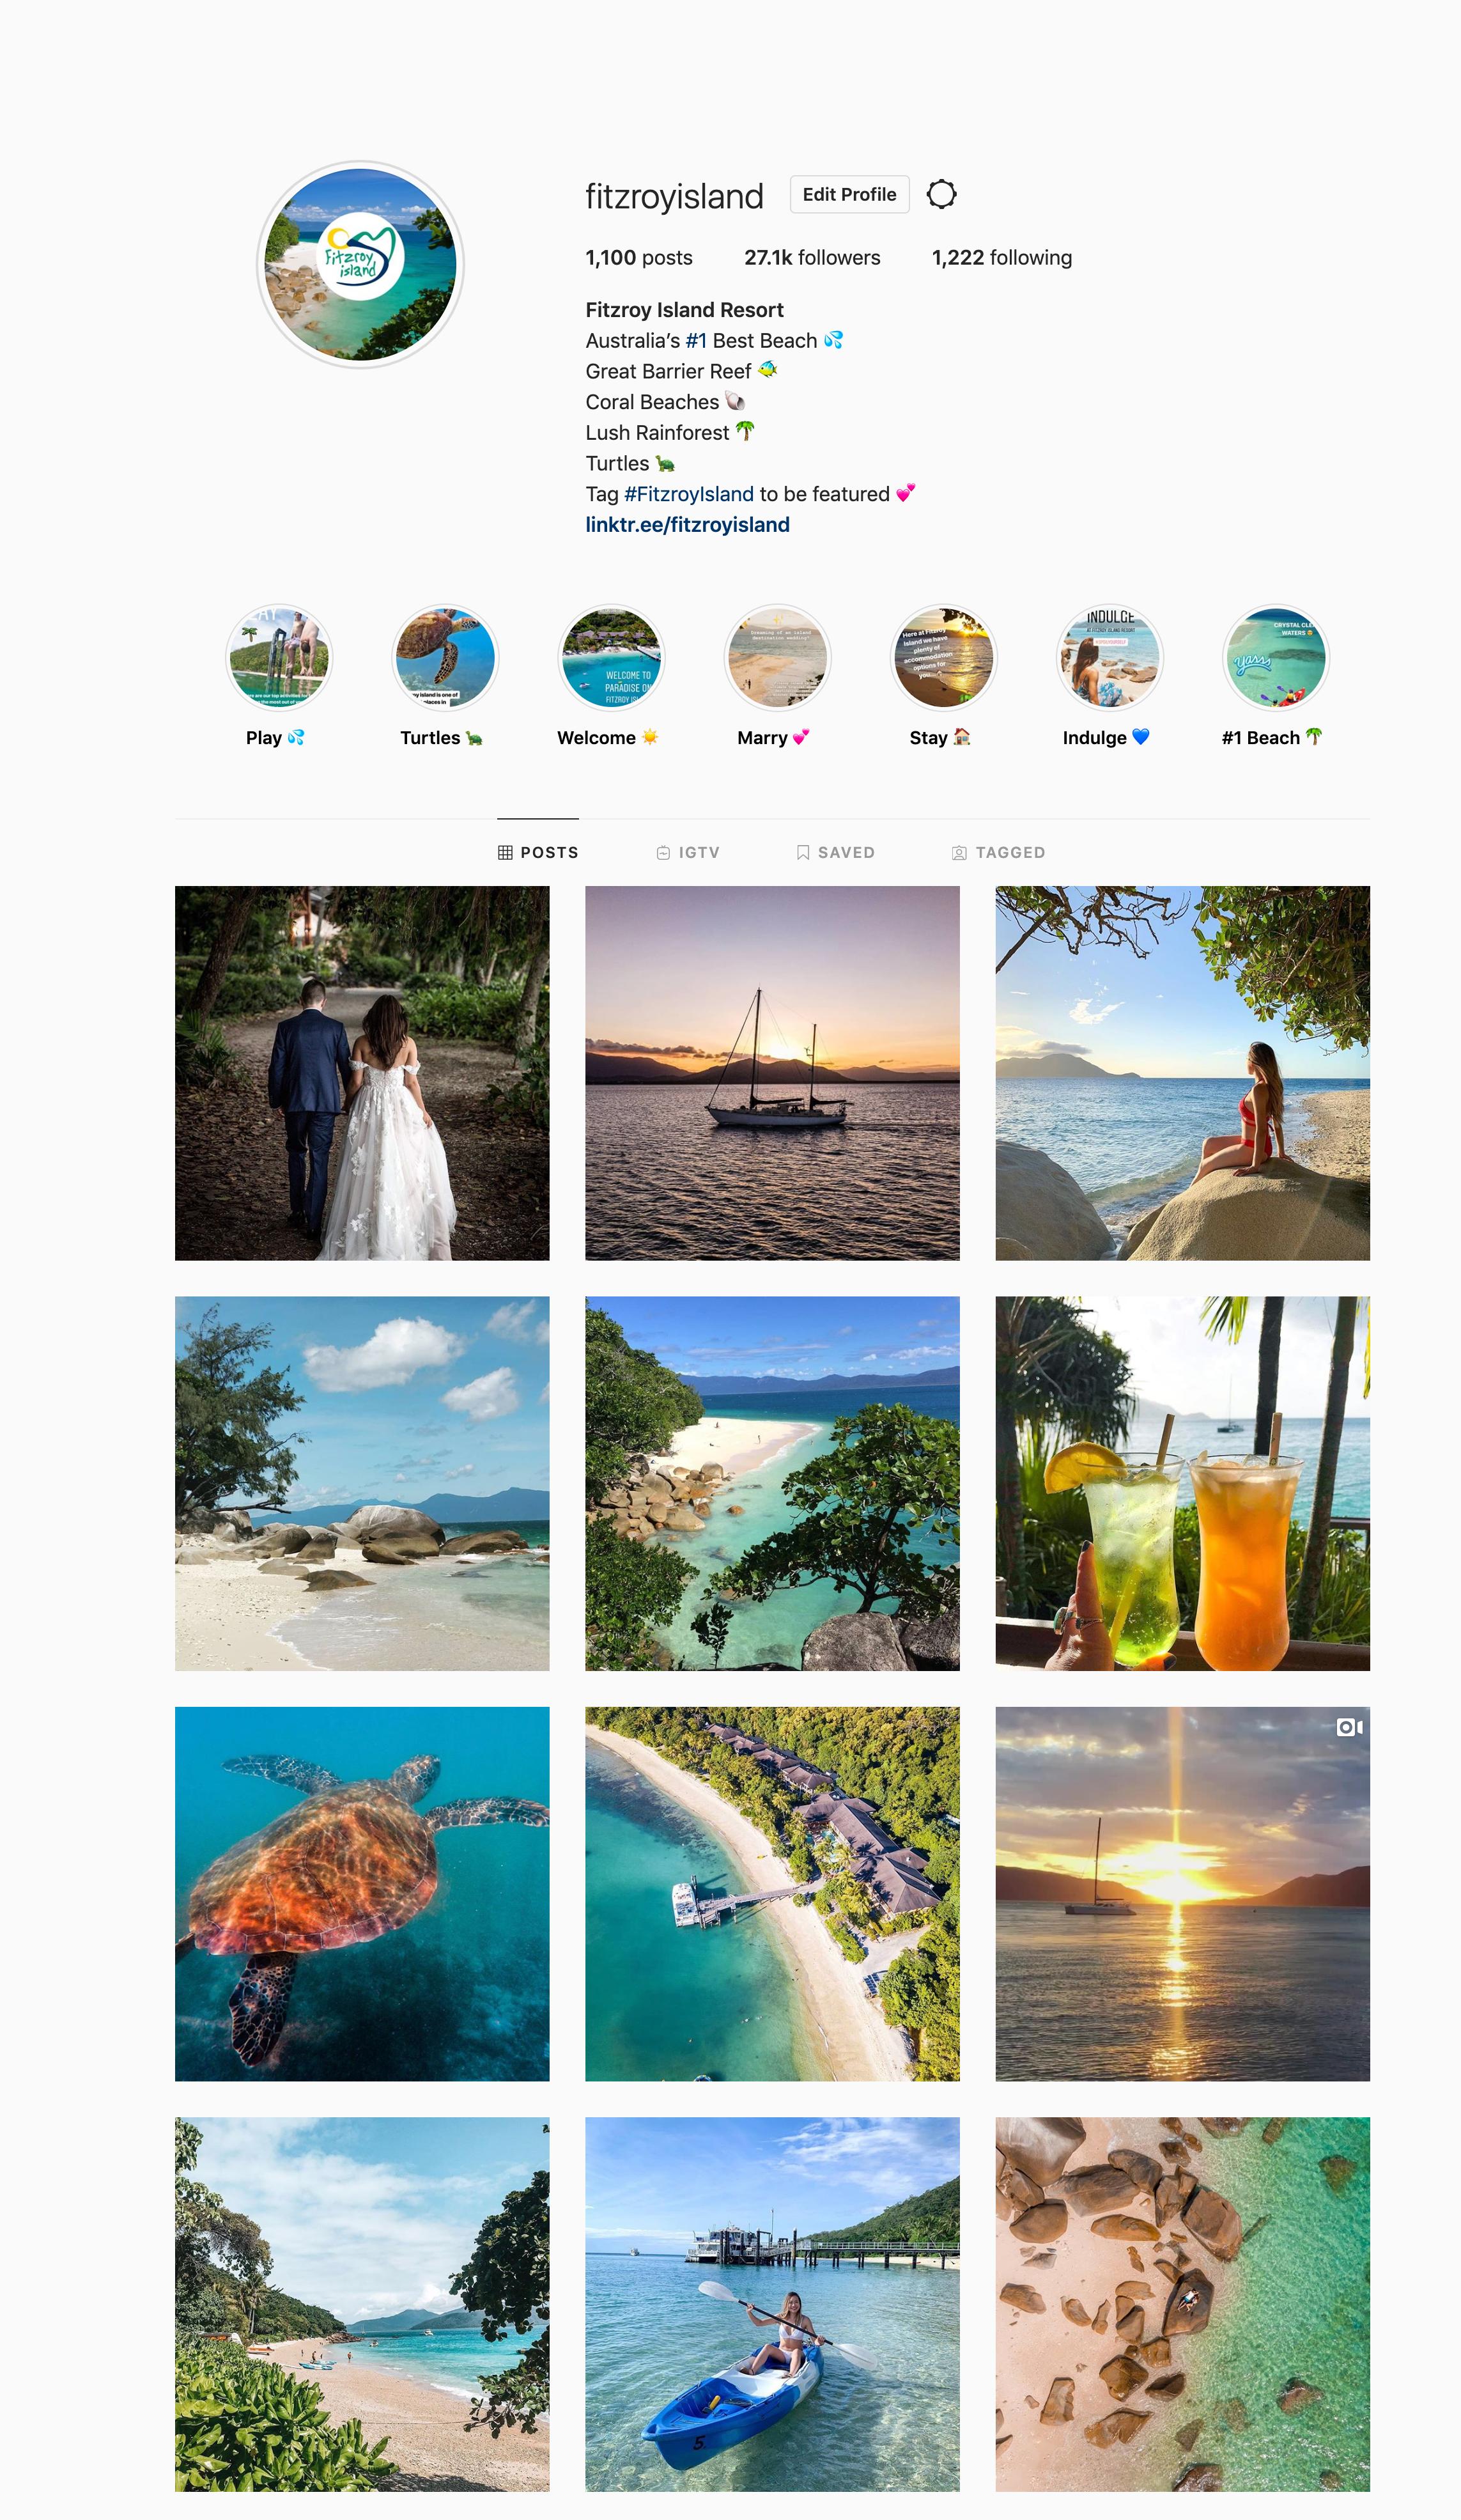 FireShot Capture 010 - Fitzroy Island Resort (@fitzroyisland) • Instagram photos and videos_ - www.instagram.com.png